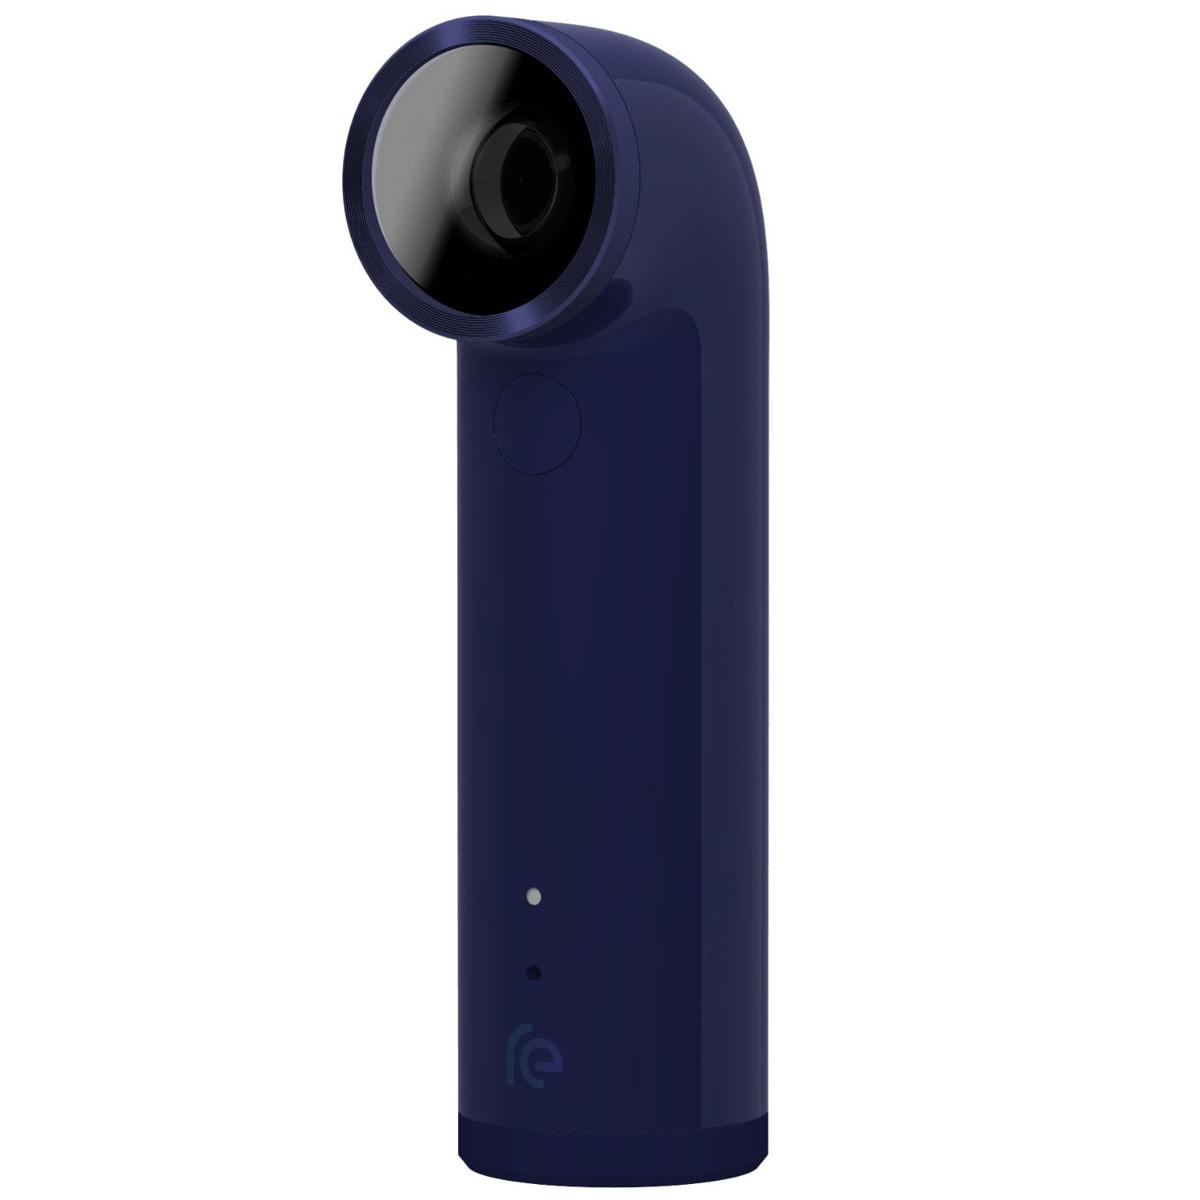 Caméra sportive HTC RE Camera Bleu Caméscope miniature Full HD étanche avec Wi-Fi et Bluetooth